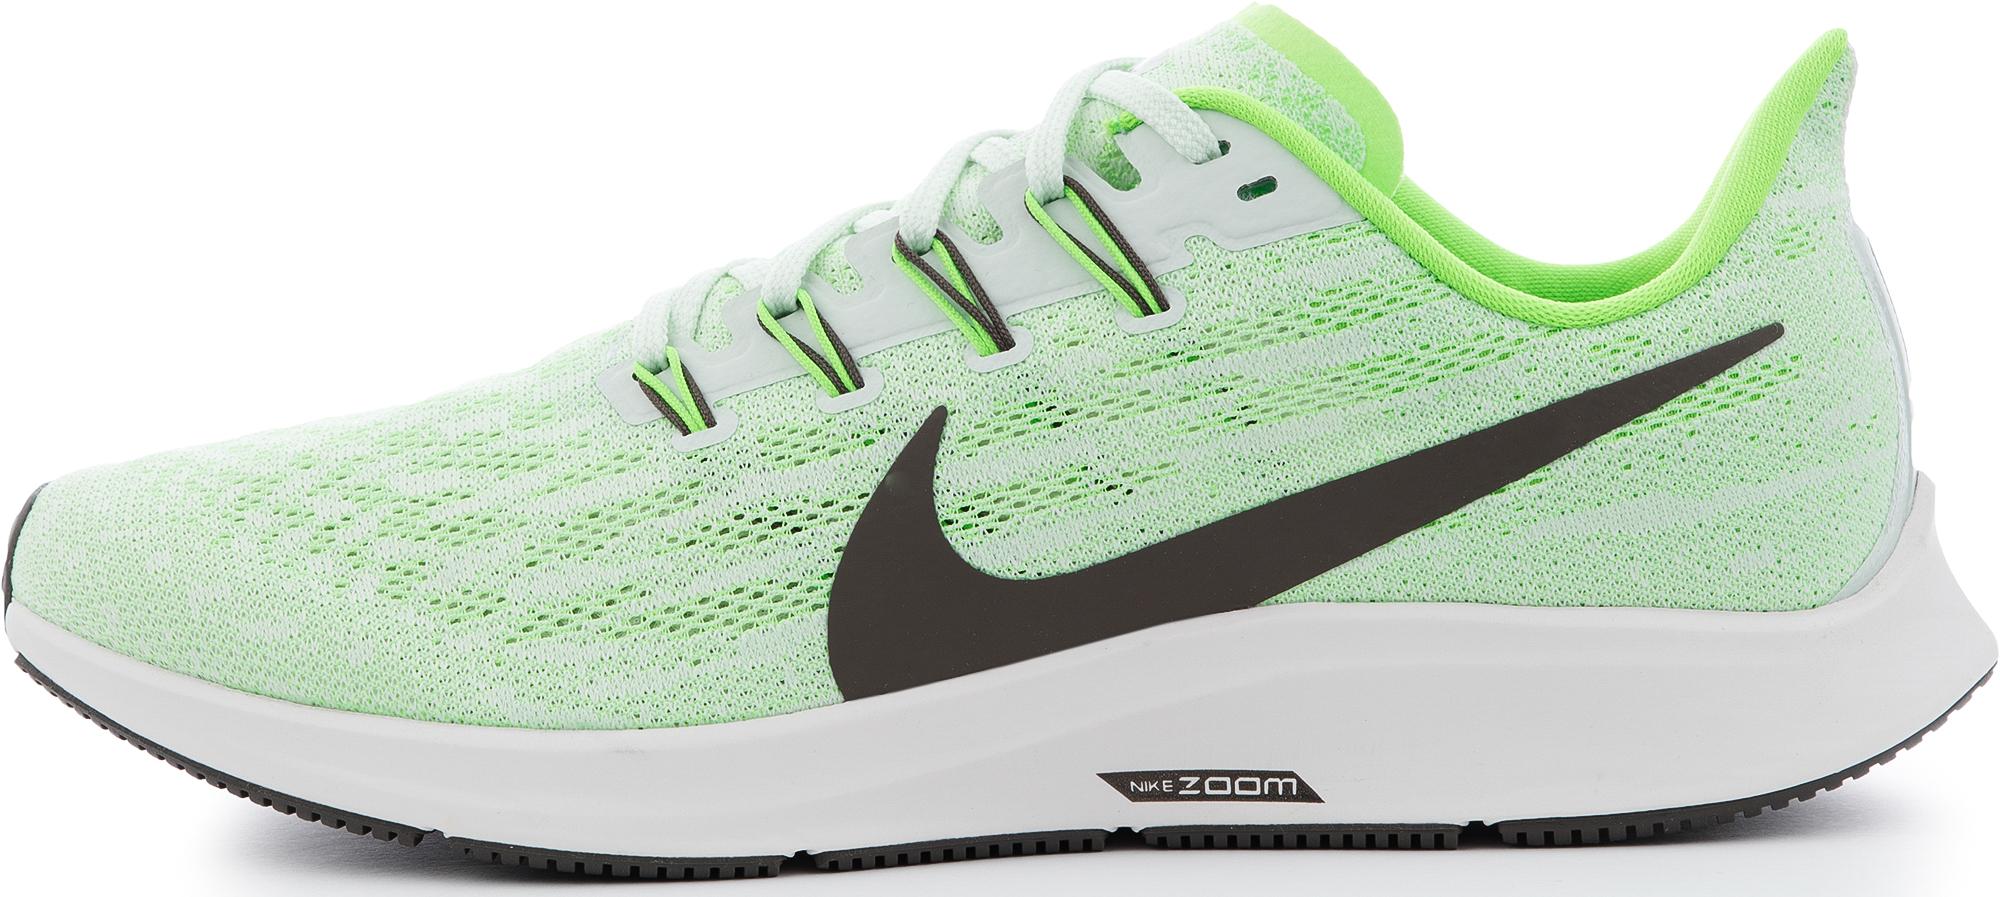 Nike Кроссовки мужские Nike Air Zoom Pegasus 36, размер 46,5 цена